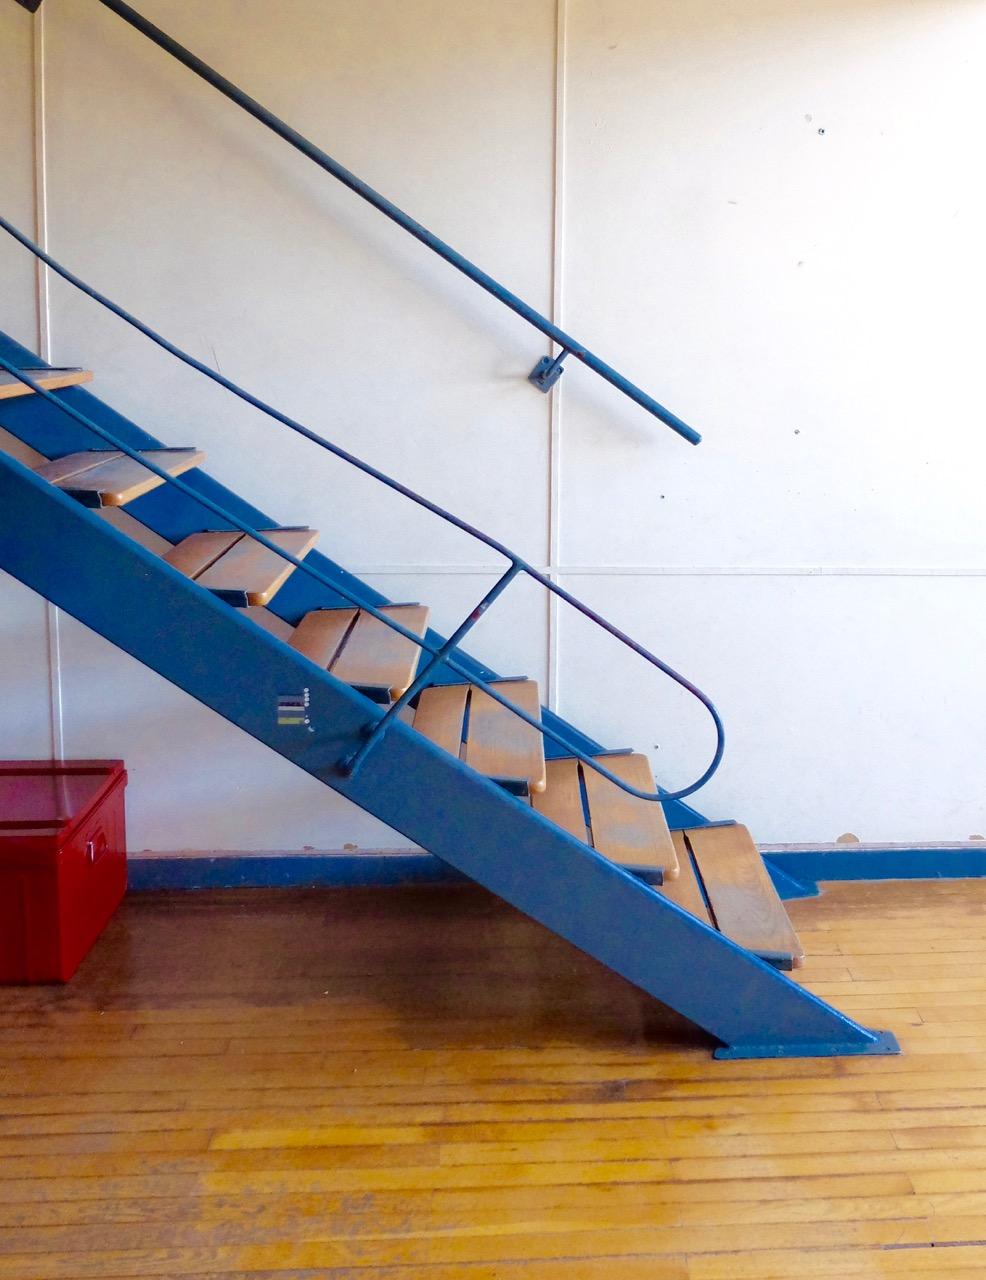 marseille-architecture-cite-radieuse-corbusier-stair-apartment